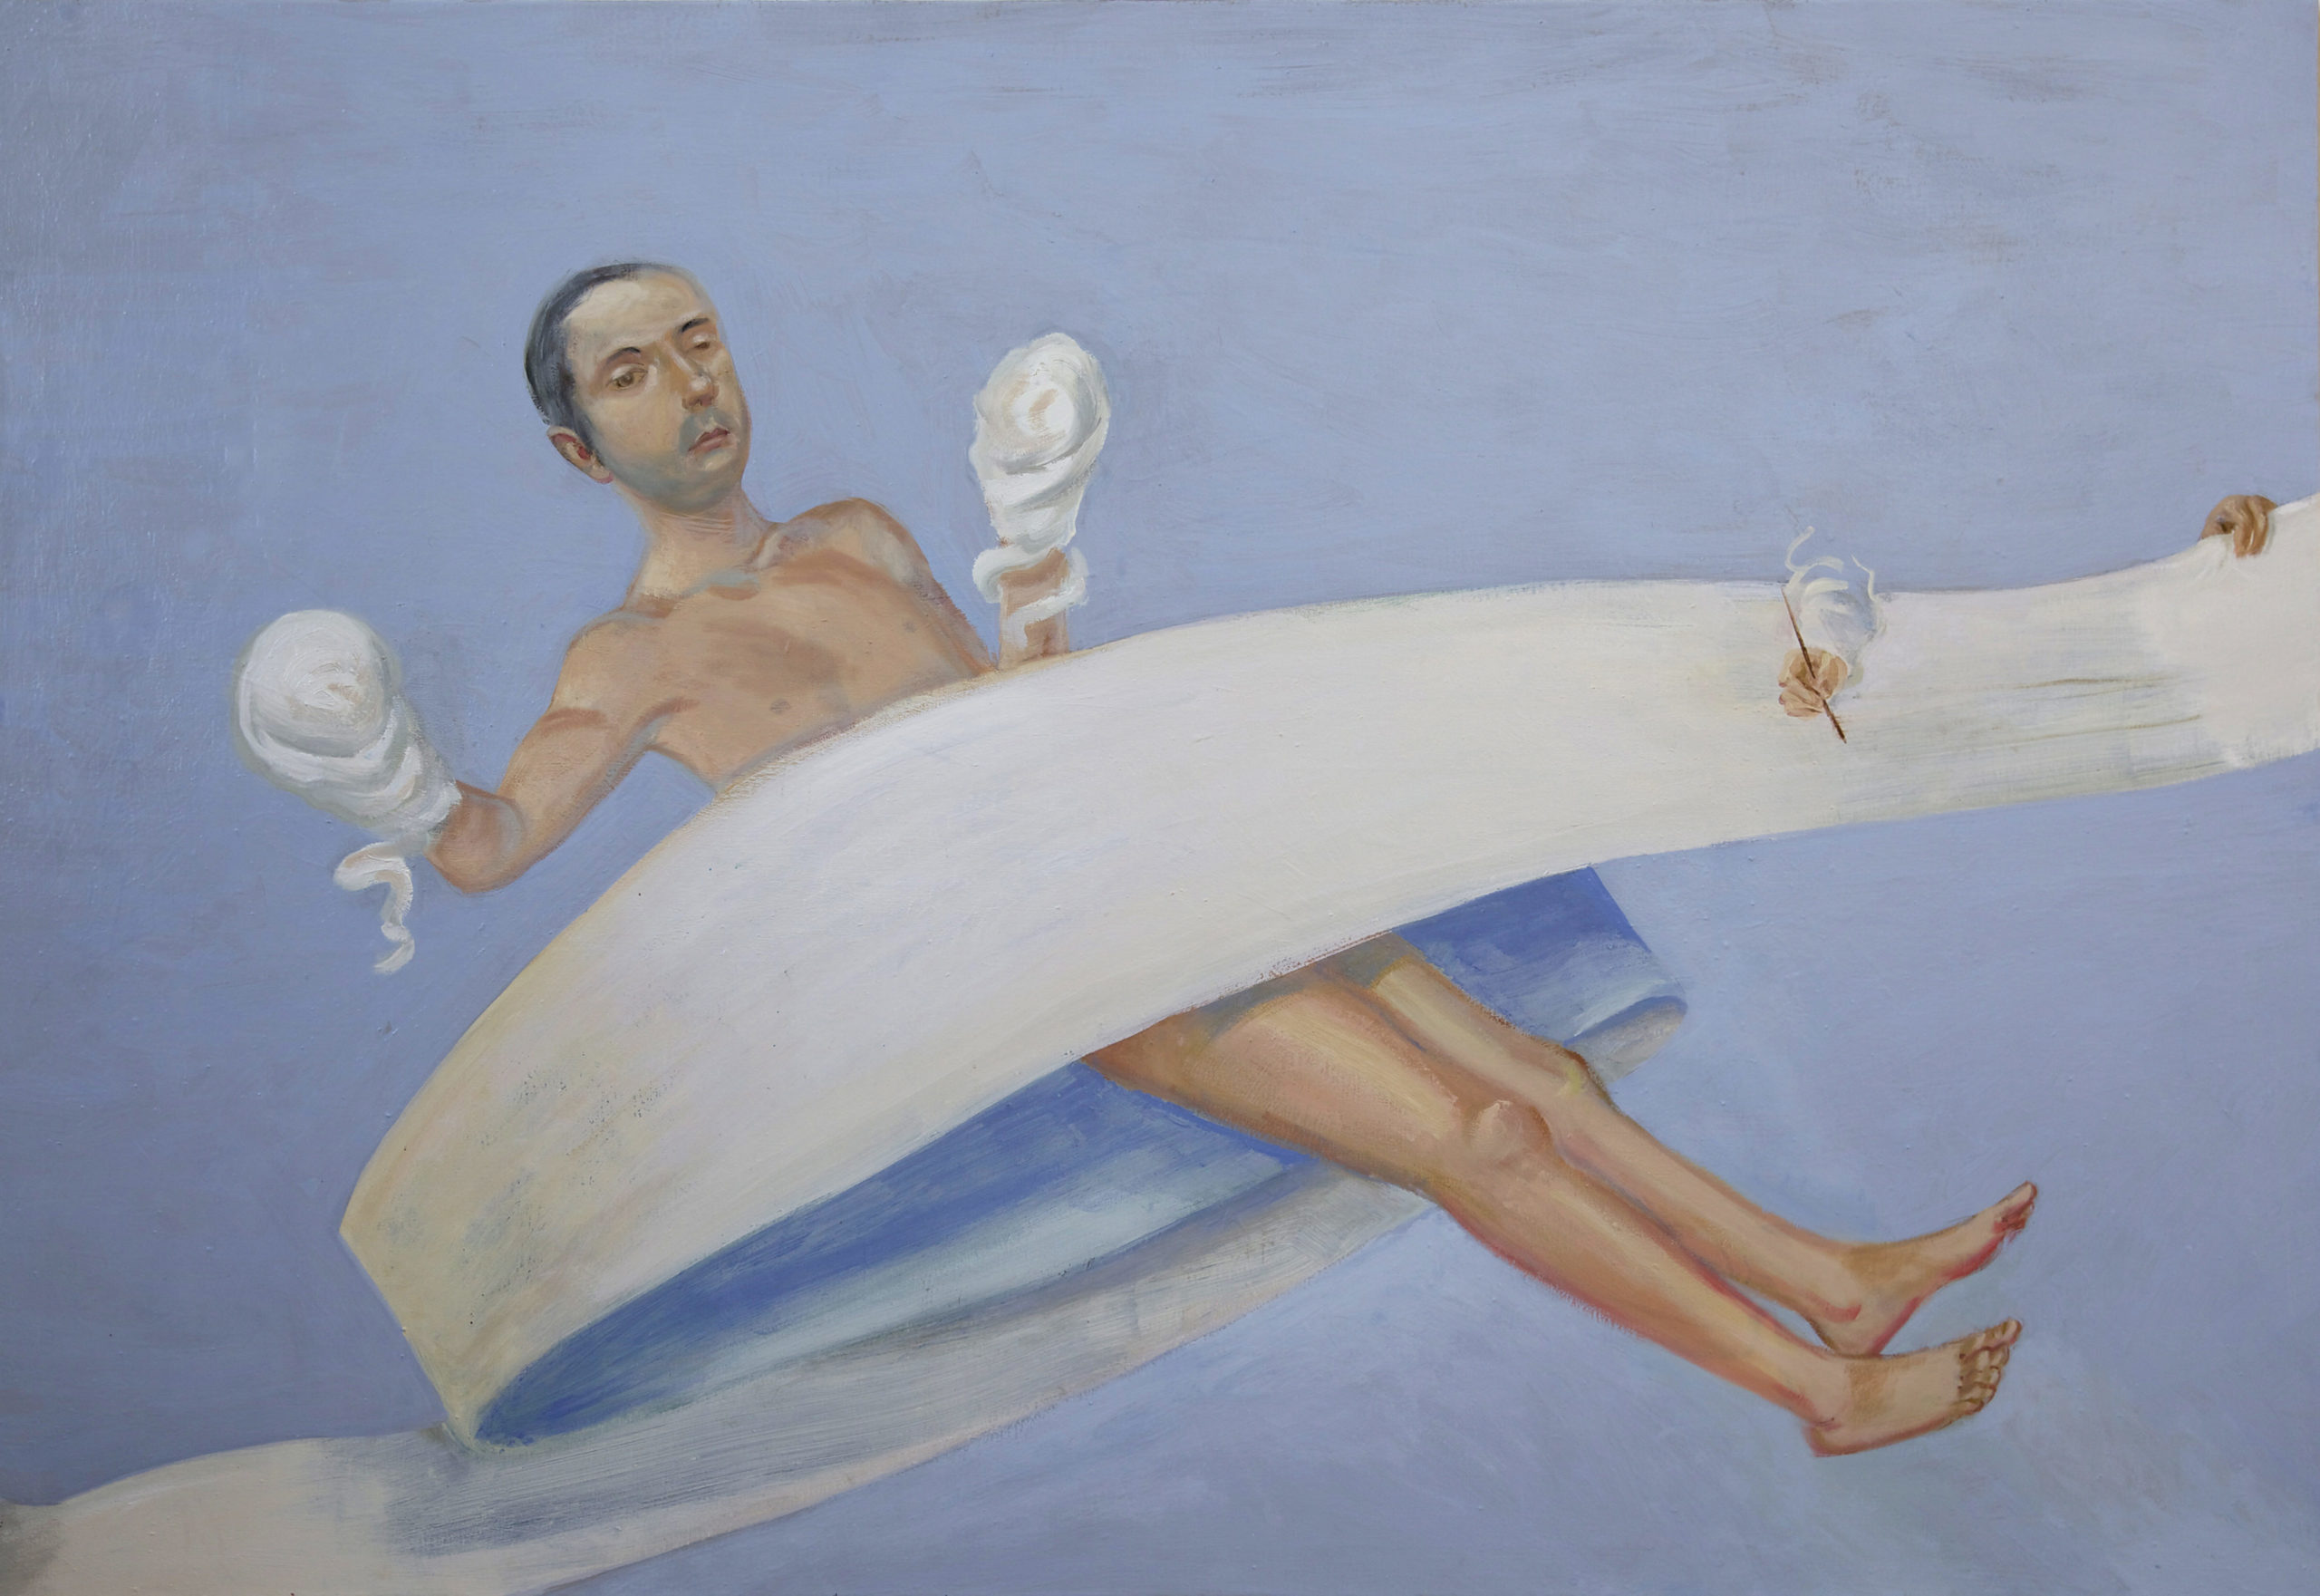 Christian Macketanz, III. Rätsel, 2018, Öl/Leinwand, 120x175 cm; Foto: Christian Macketanz